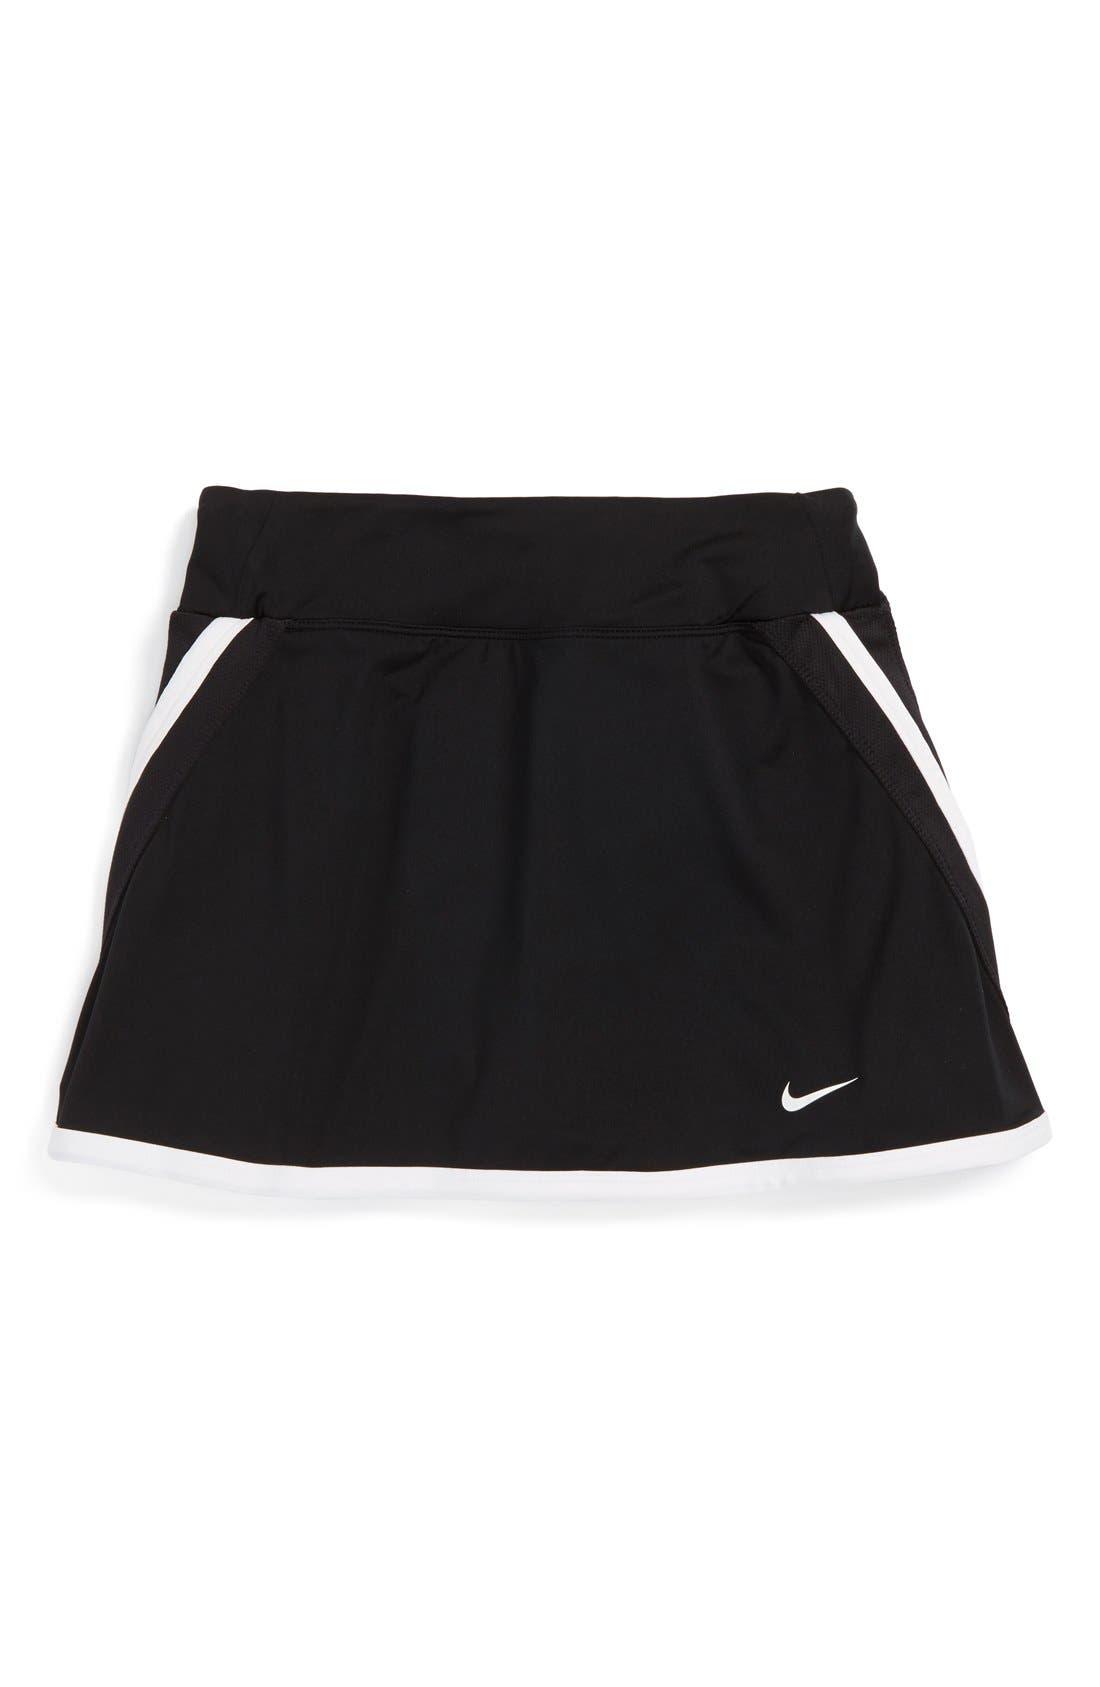 Alternate Image 1 Selected - Nike 'Power' Dri-FIT Tennis Skirt (Big Girls)